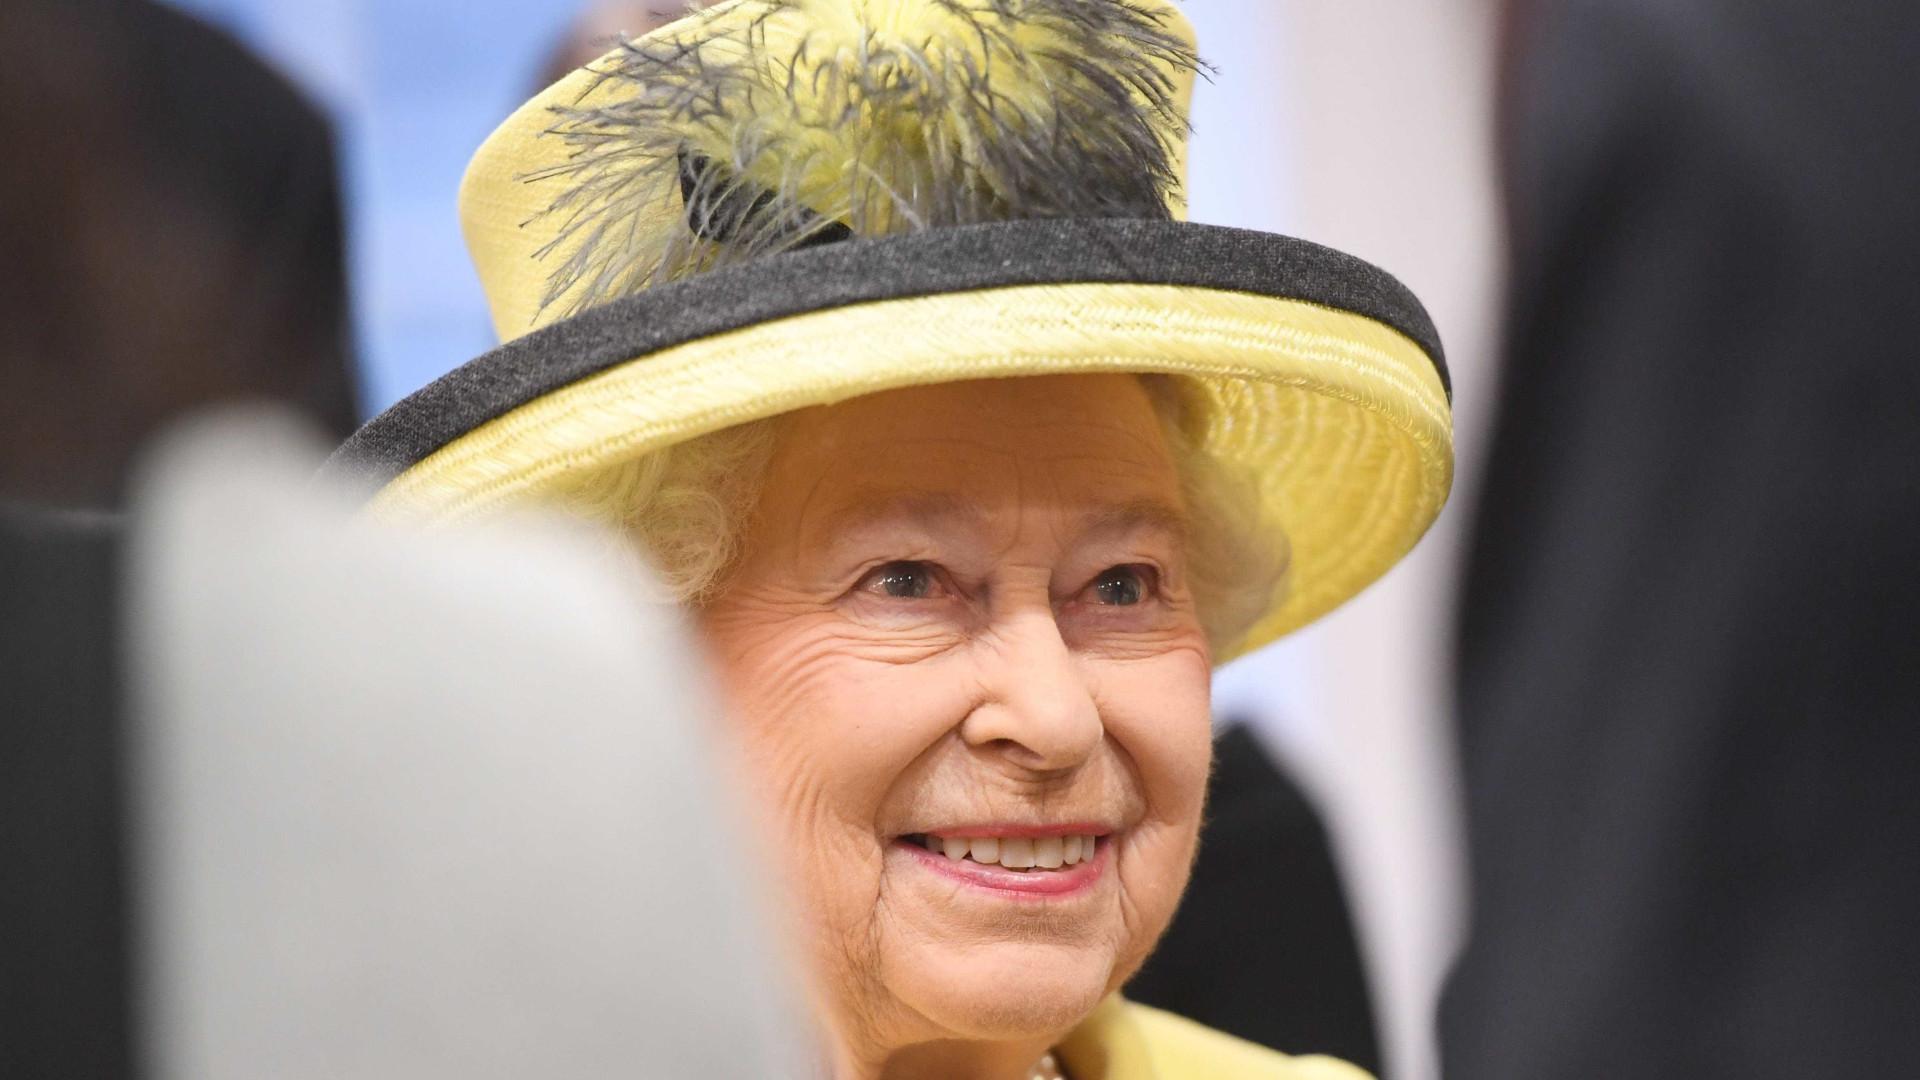 Carlos chama-lhe 'mamã' e Isabel II... revira os olhos